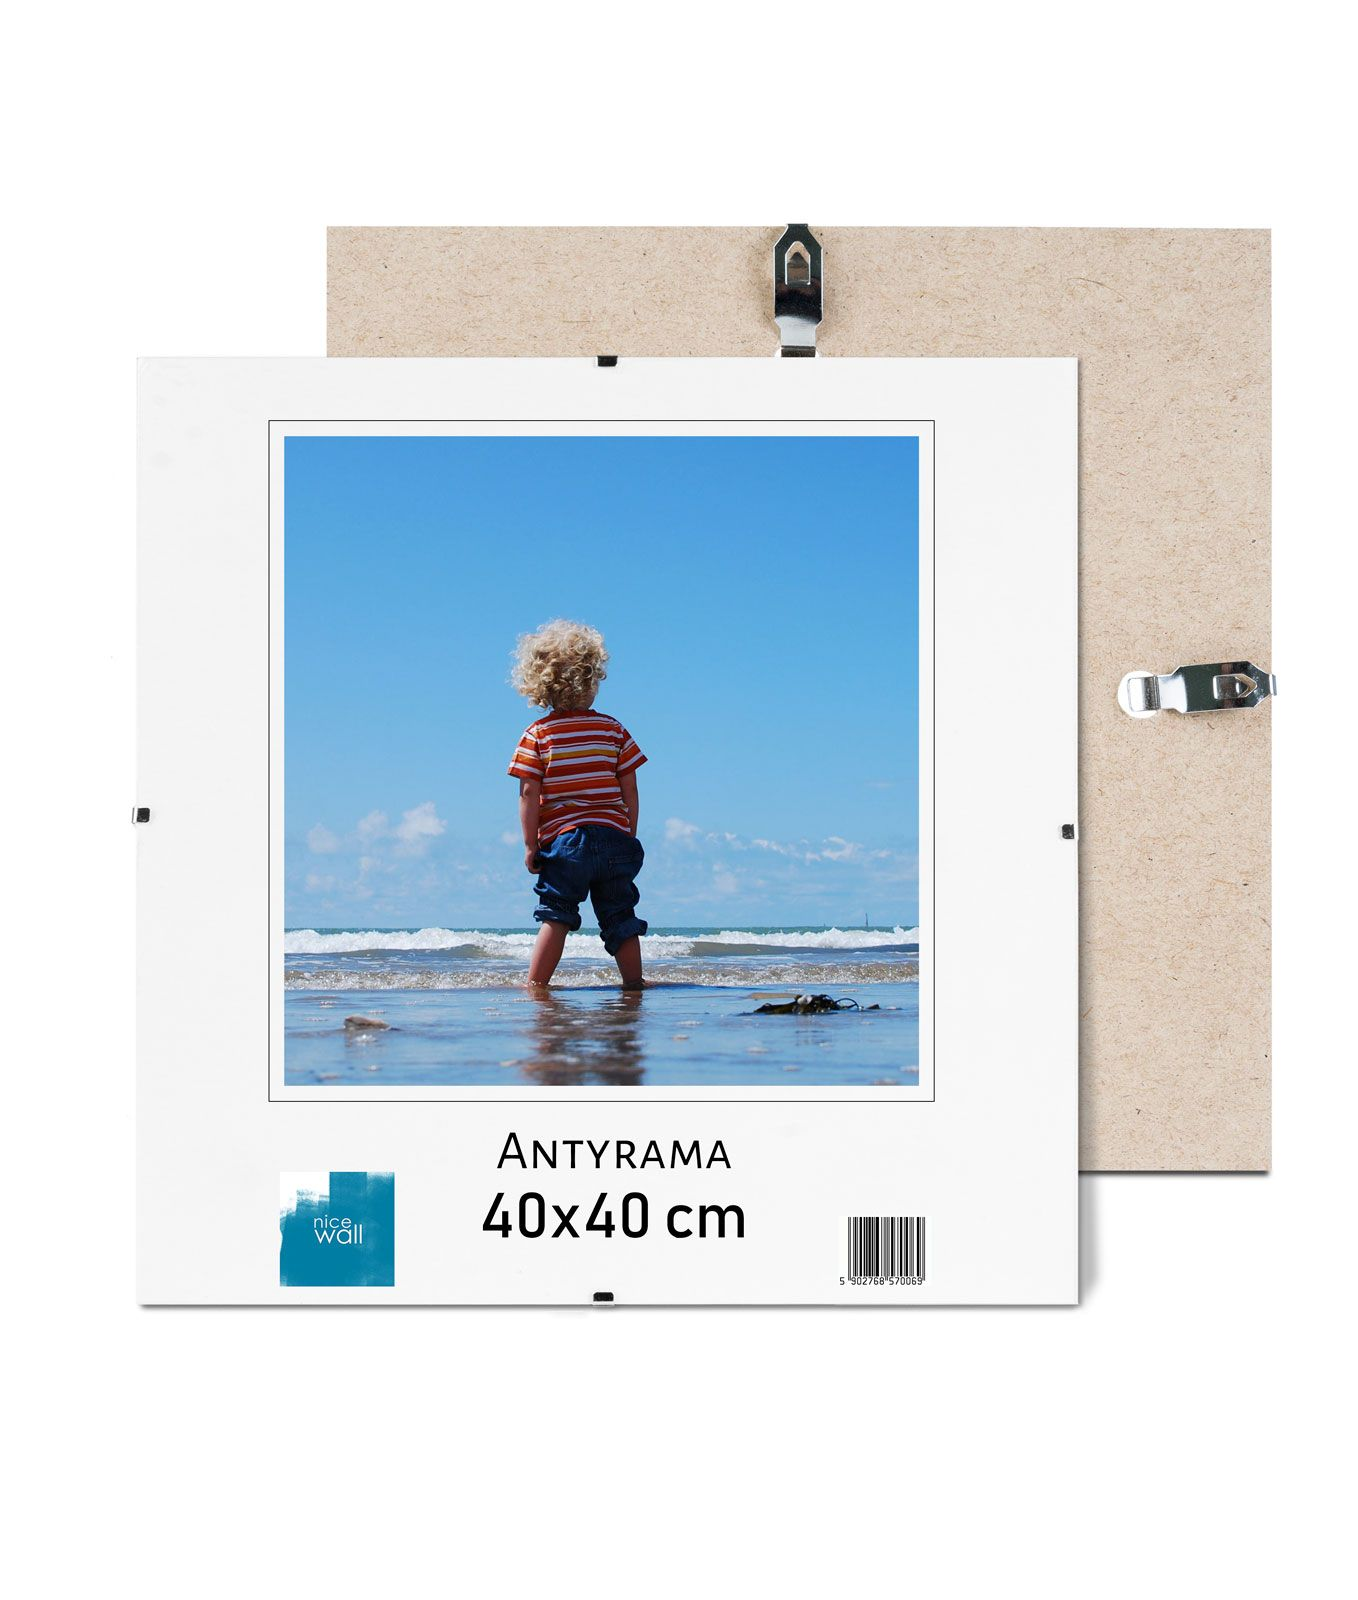 Antiram 40x40 cm Anti-Arm 40x40 cm Photo Frame